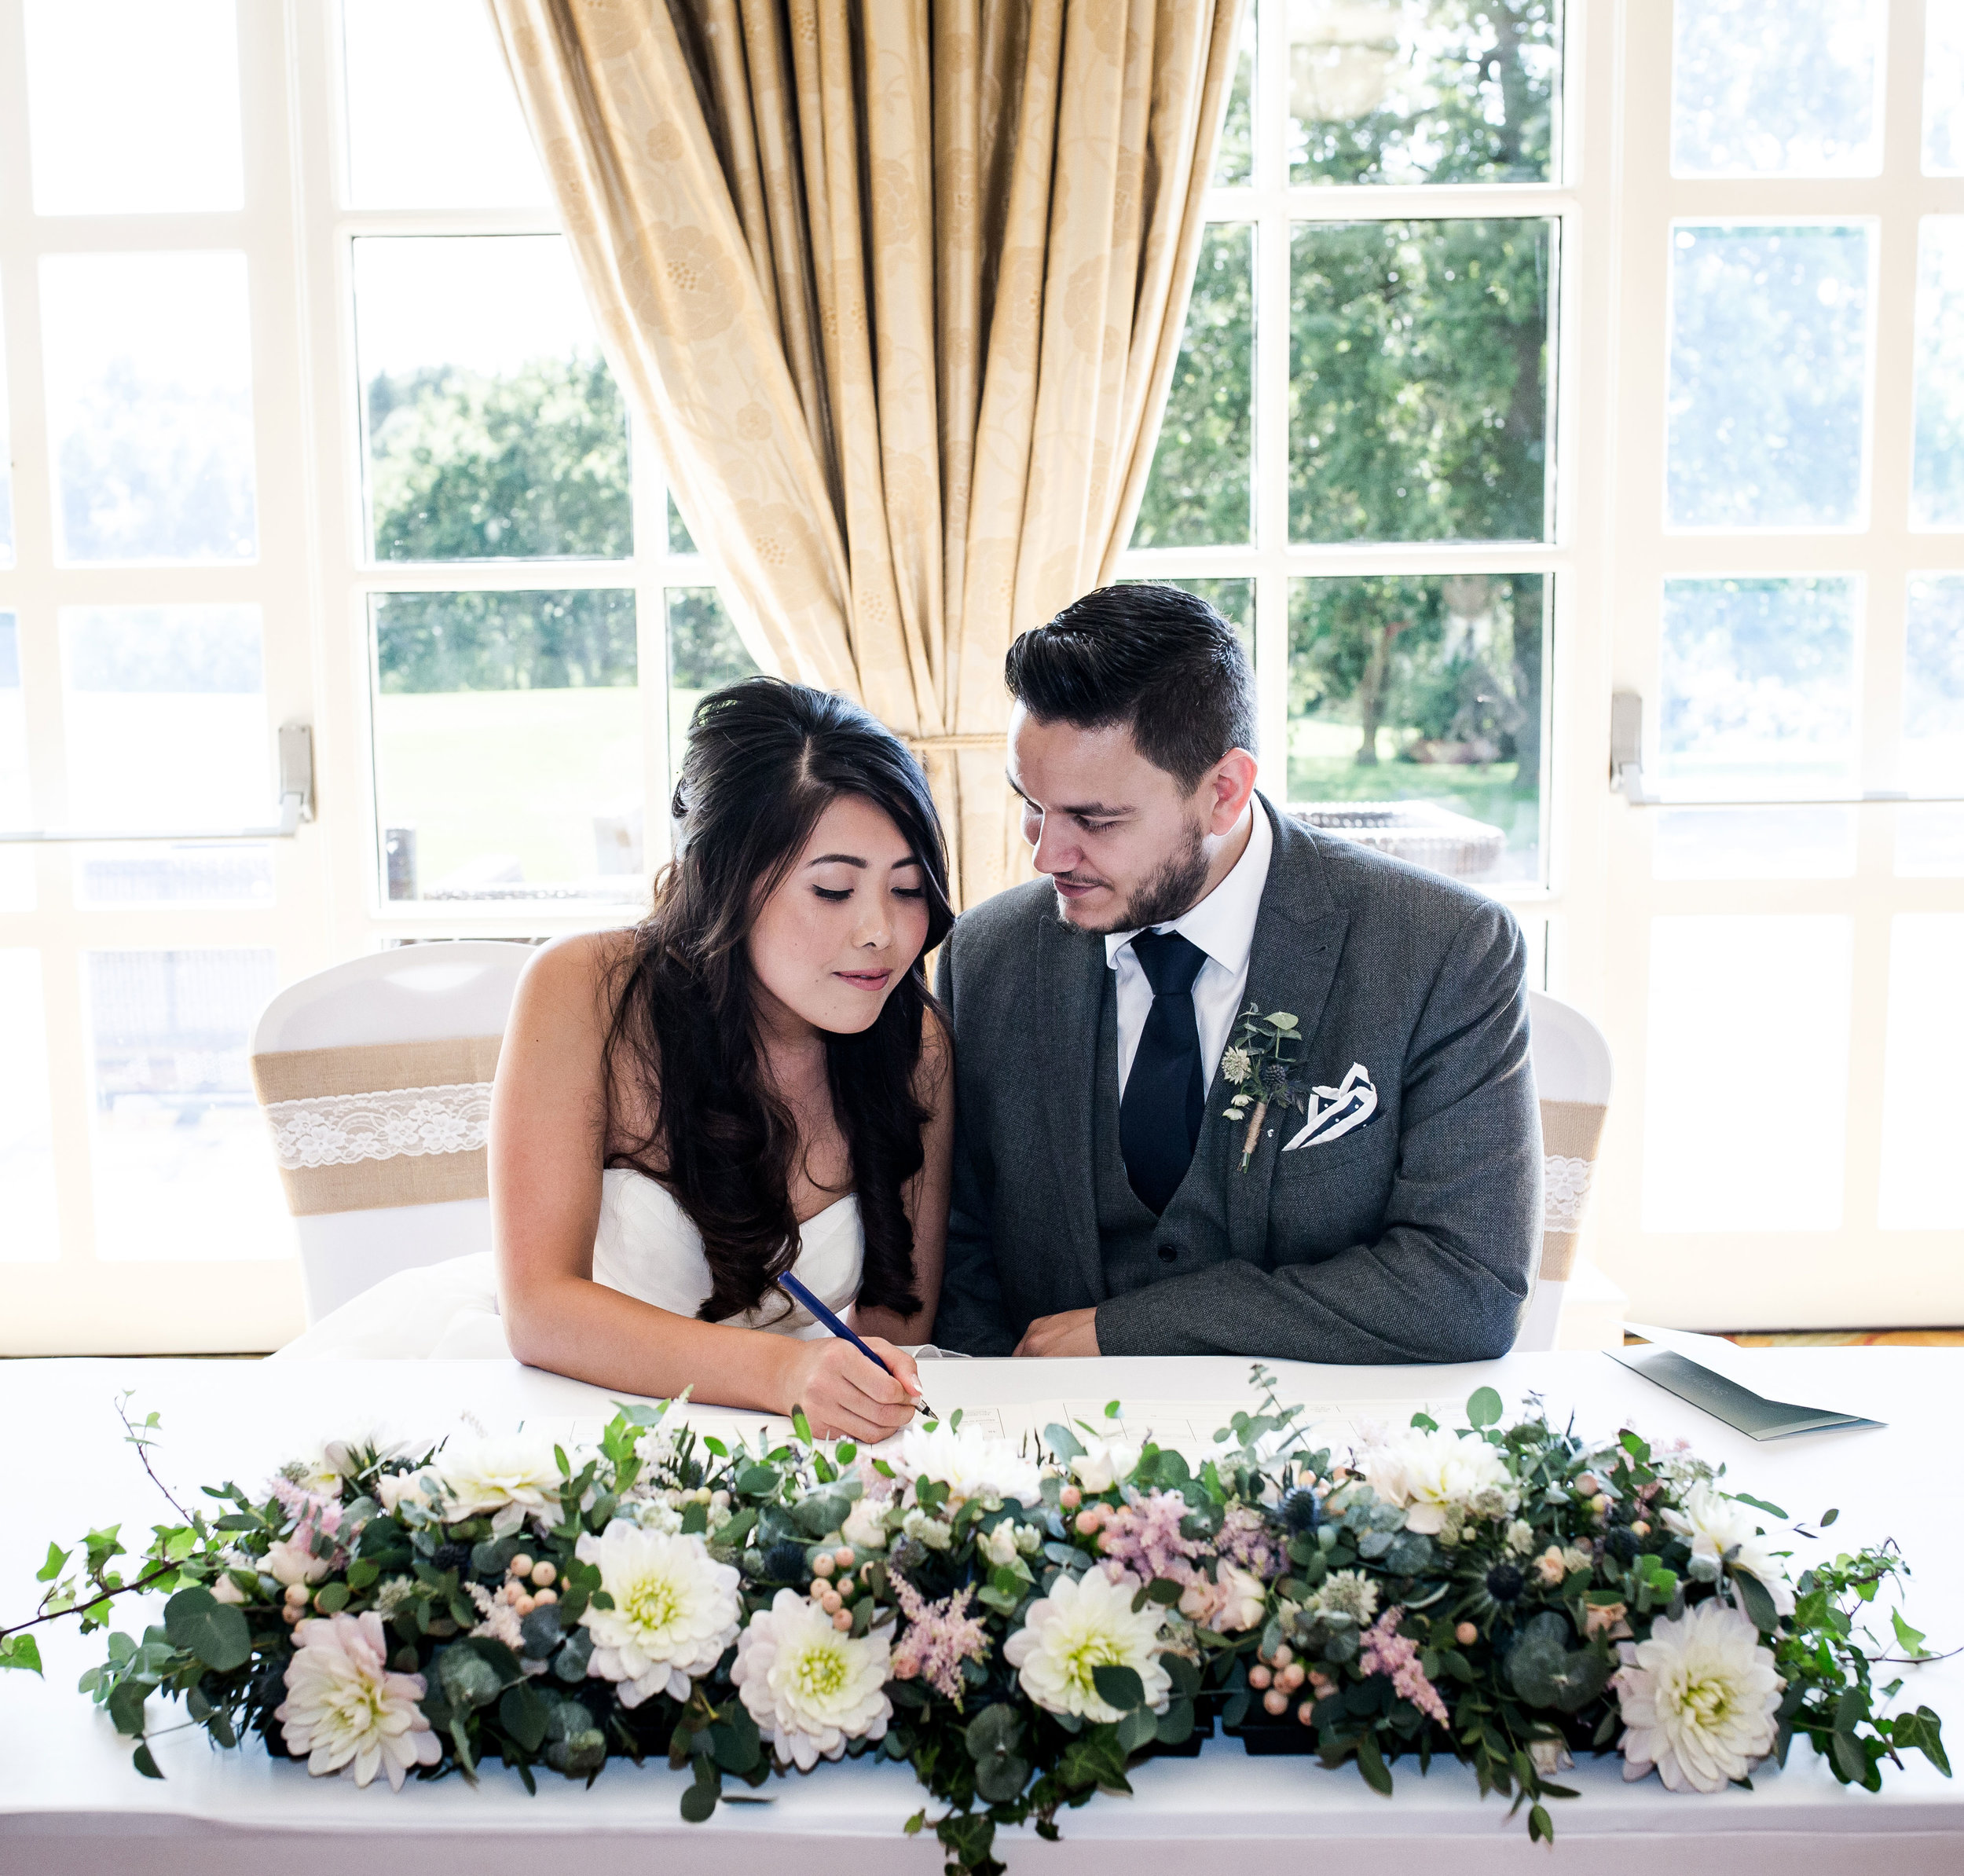 The Wedding Garland